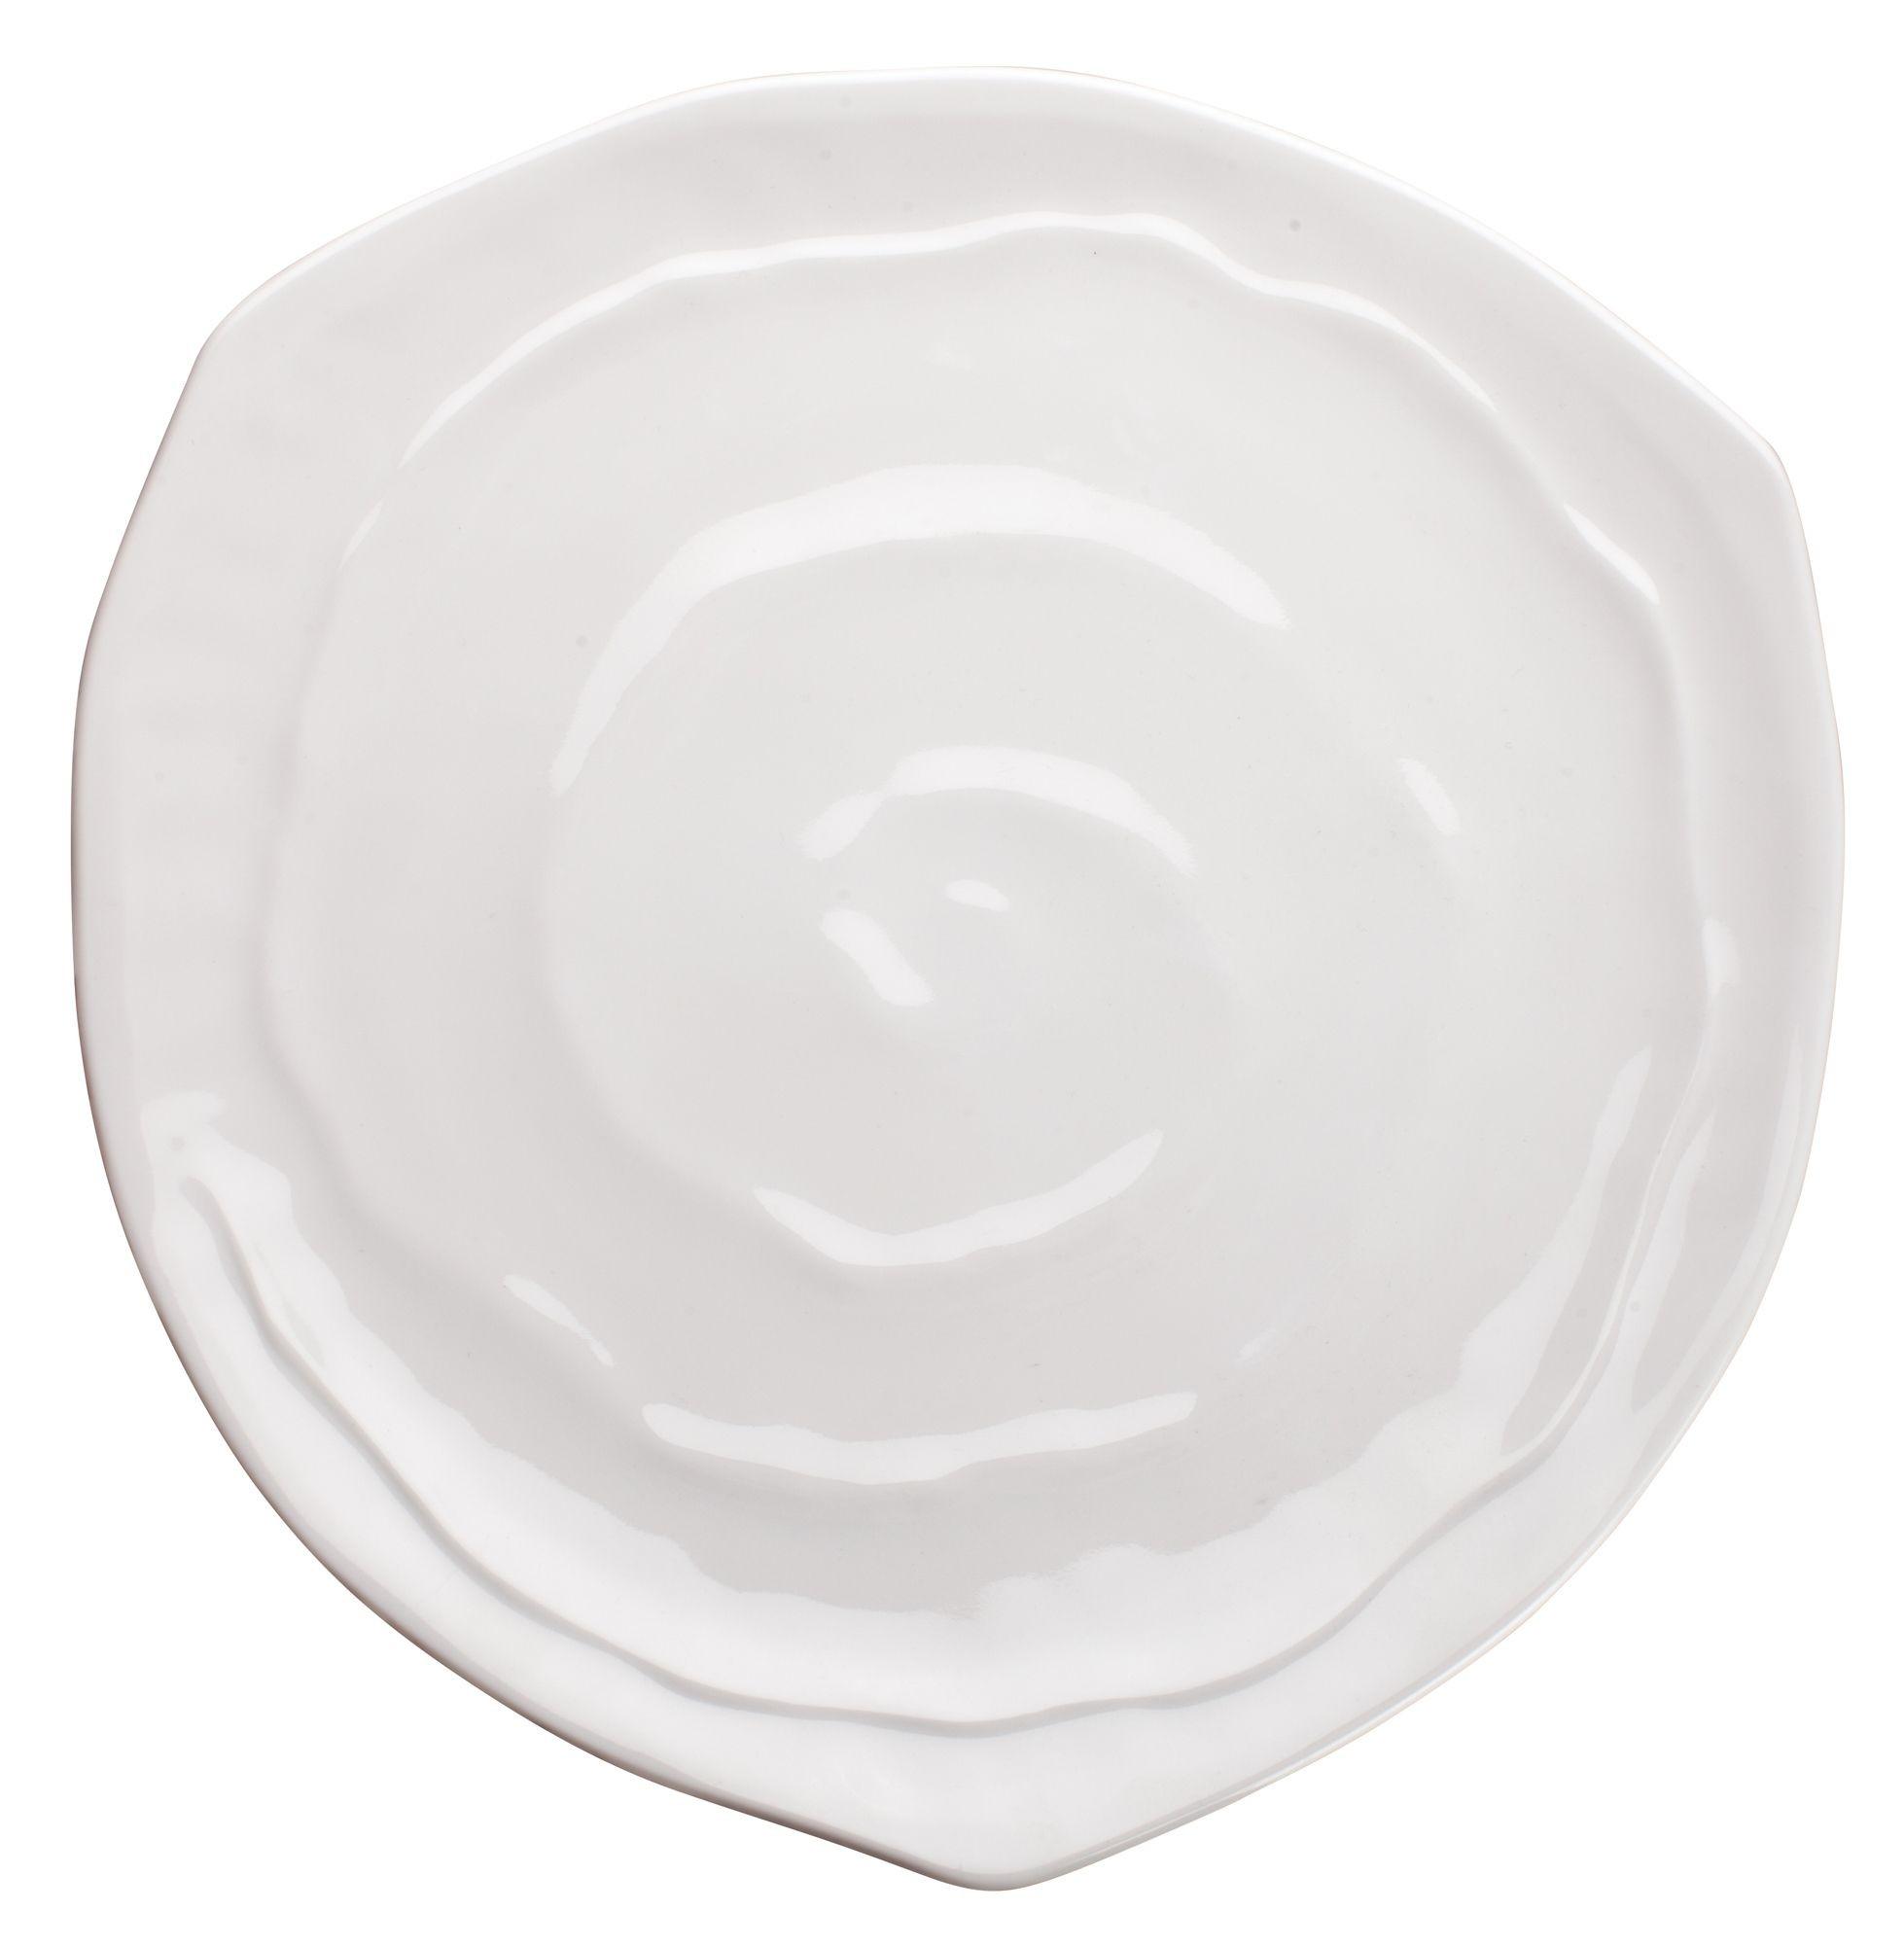 "Winco WDM007-202 Selena Melamine White Triangular Plate 10-5/8"""